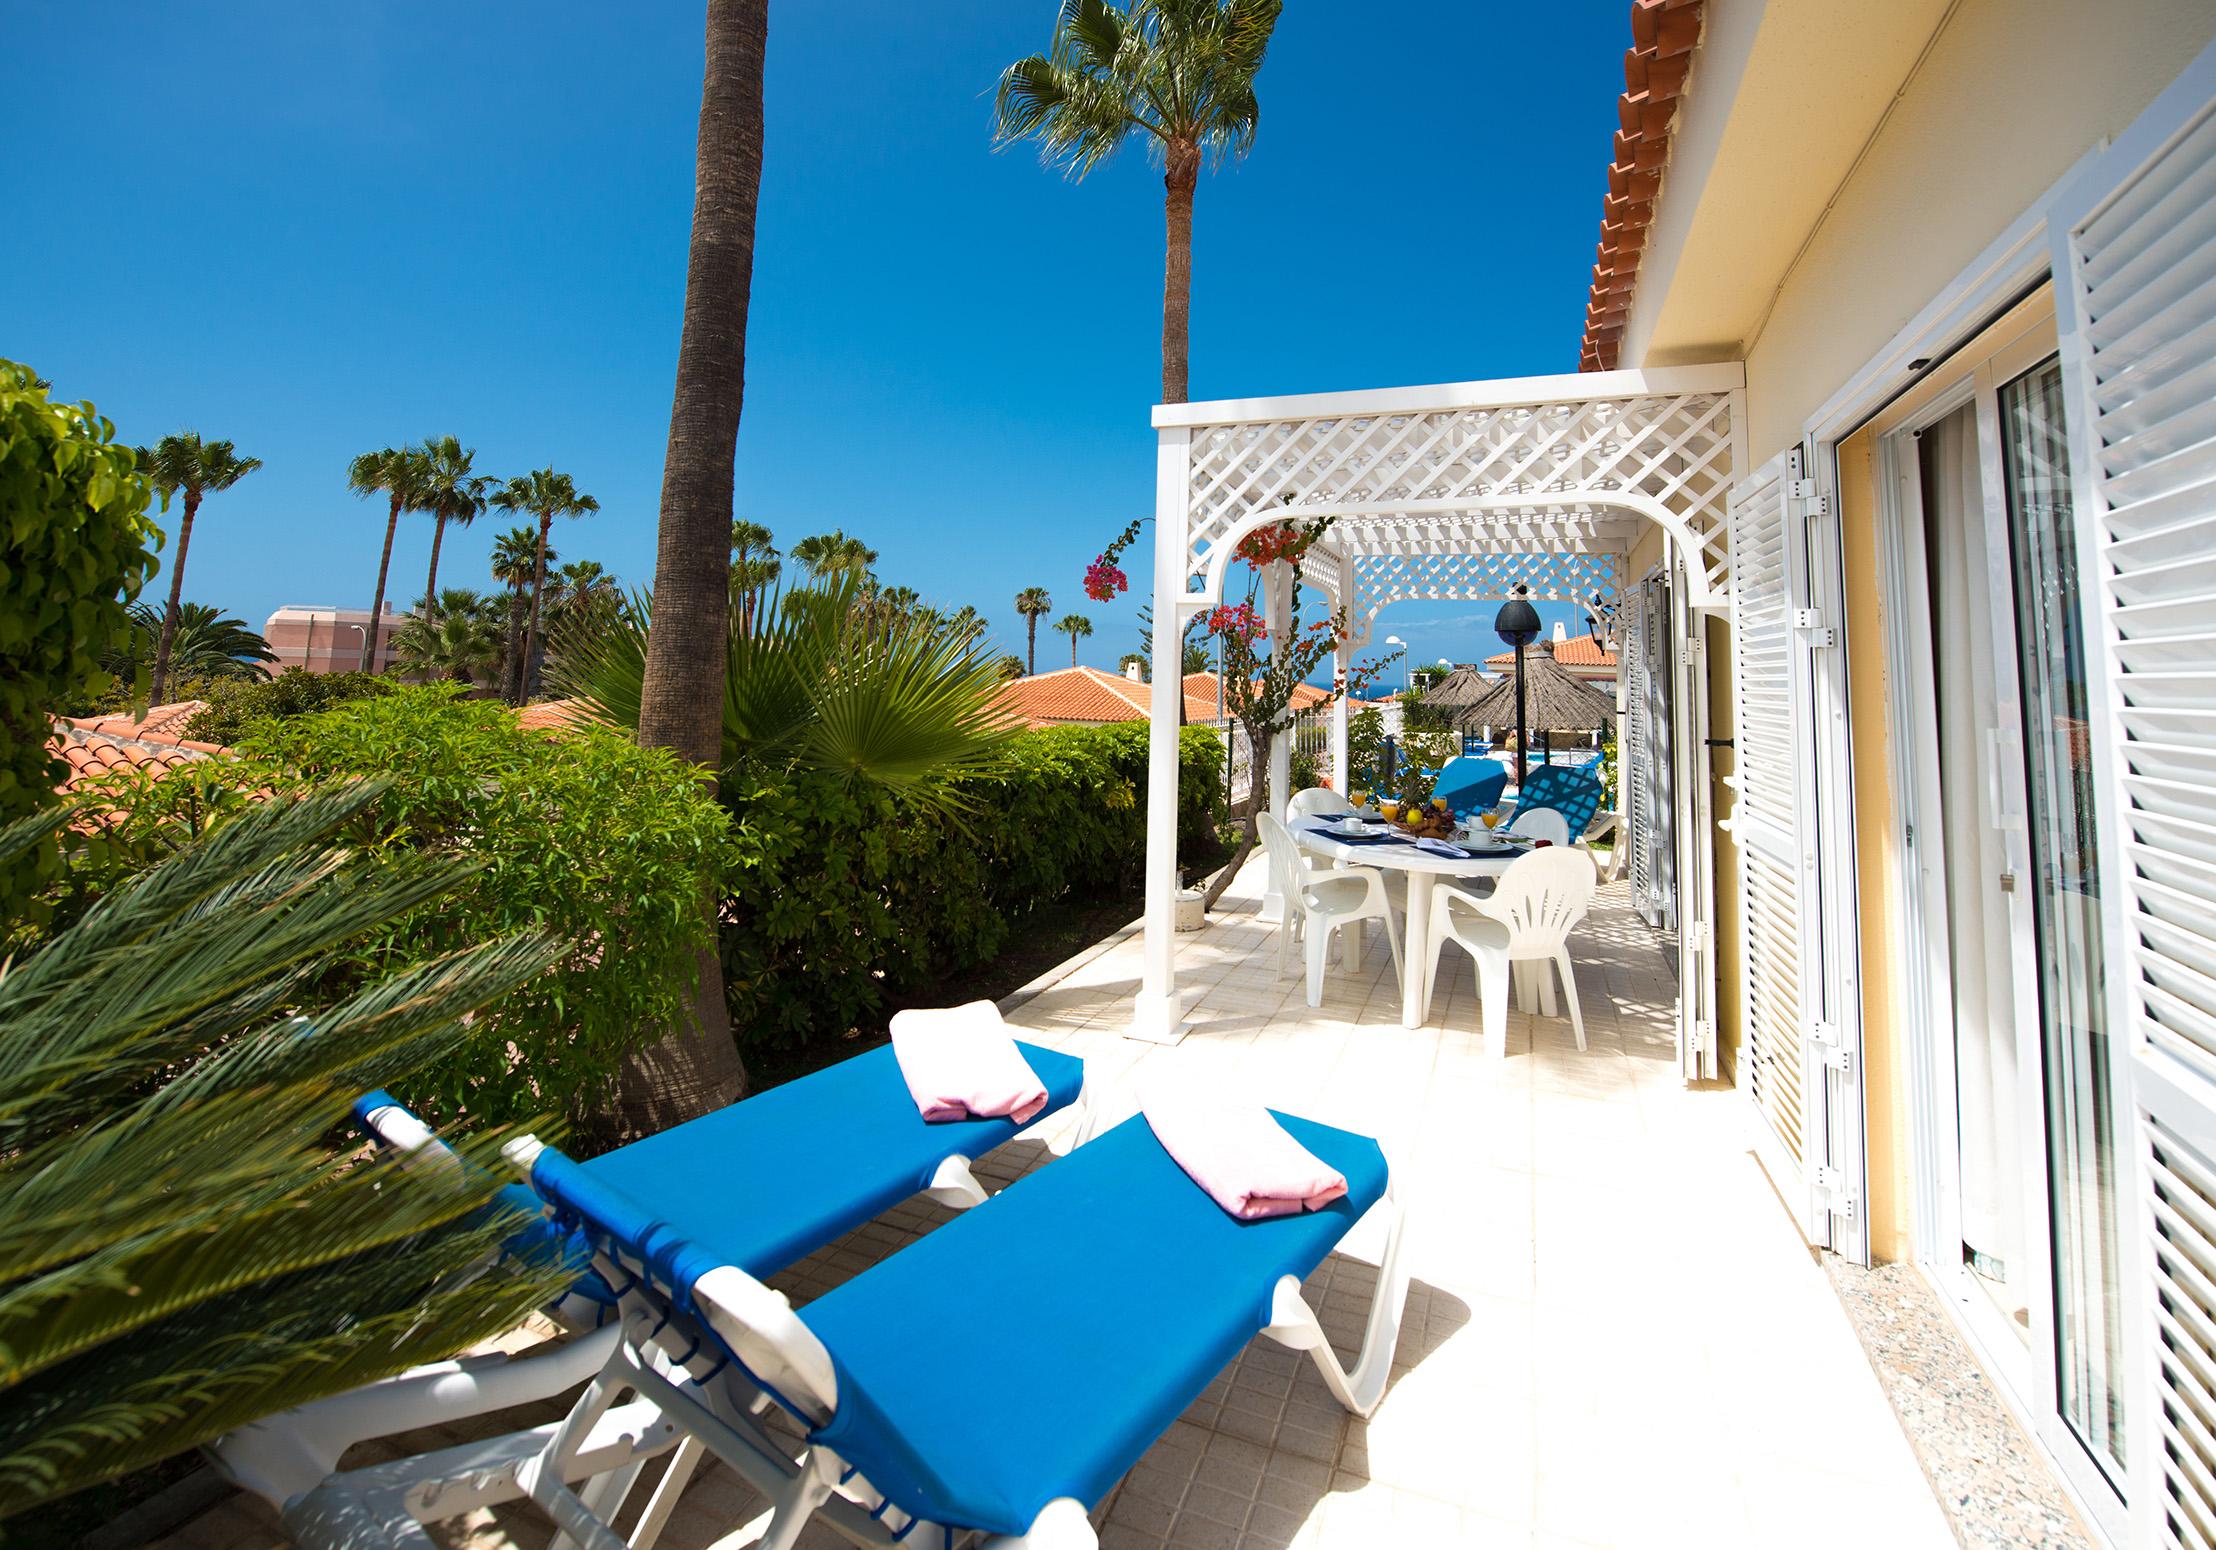 Sueño Azul Terrace 4